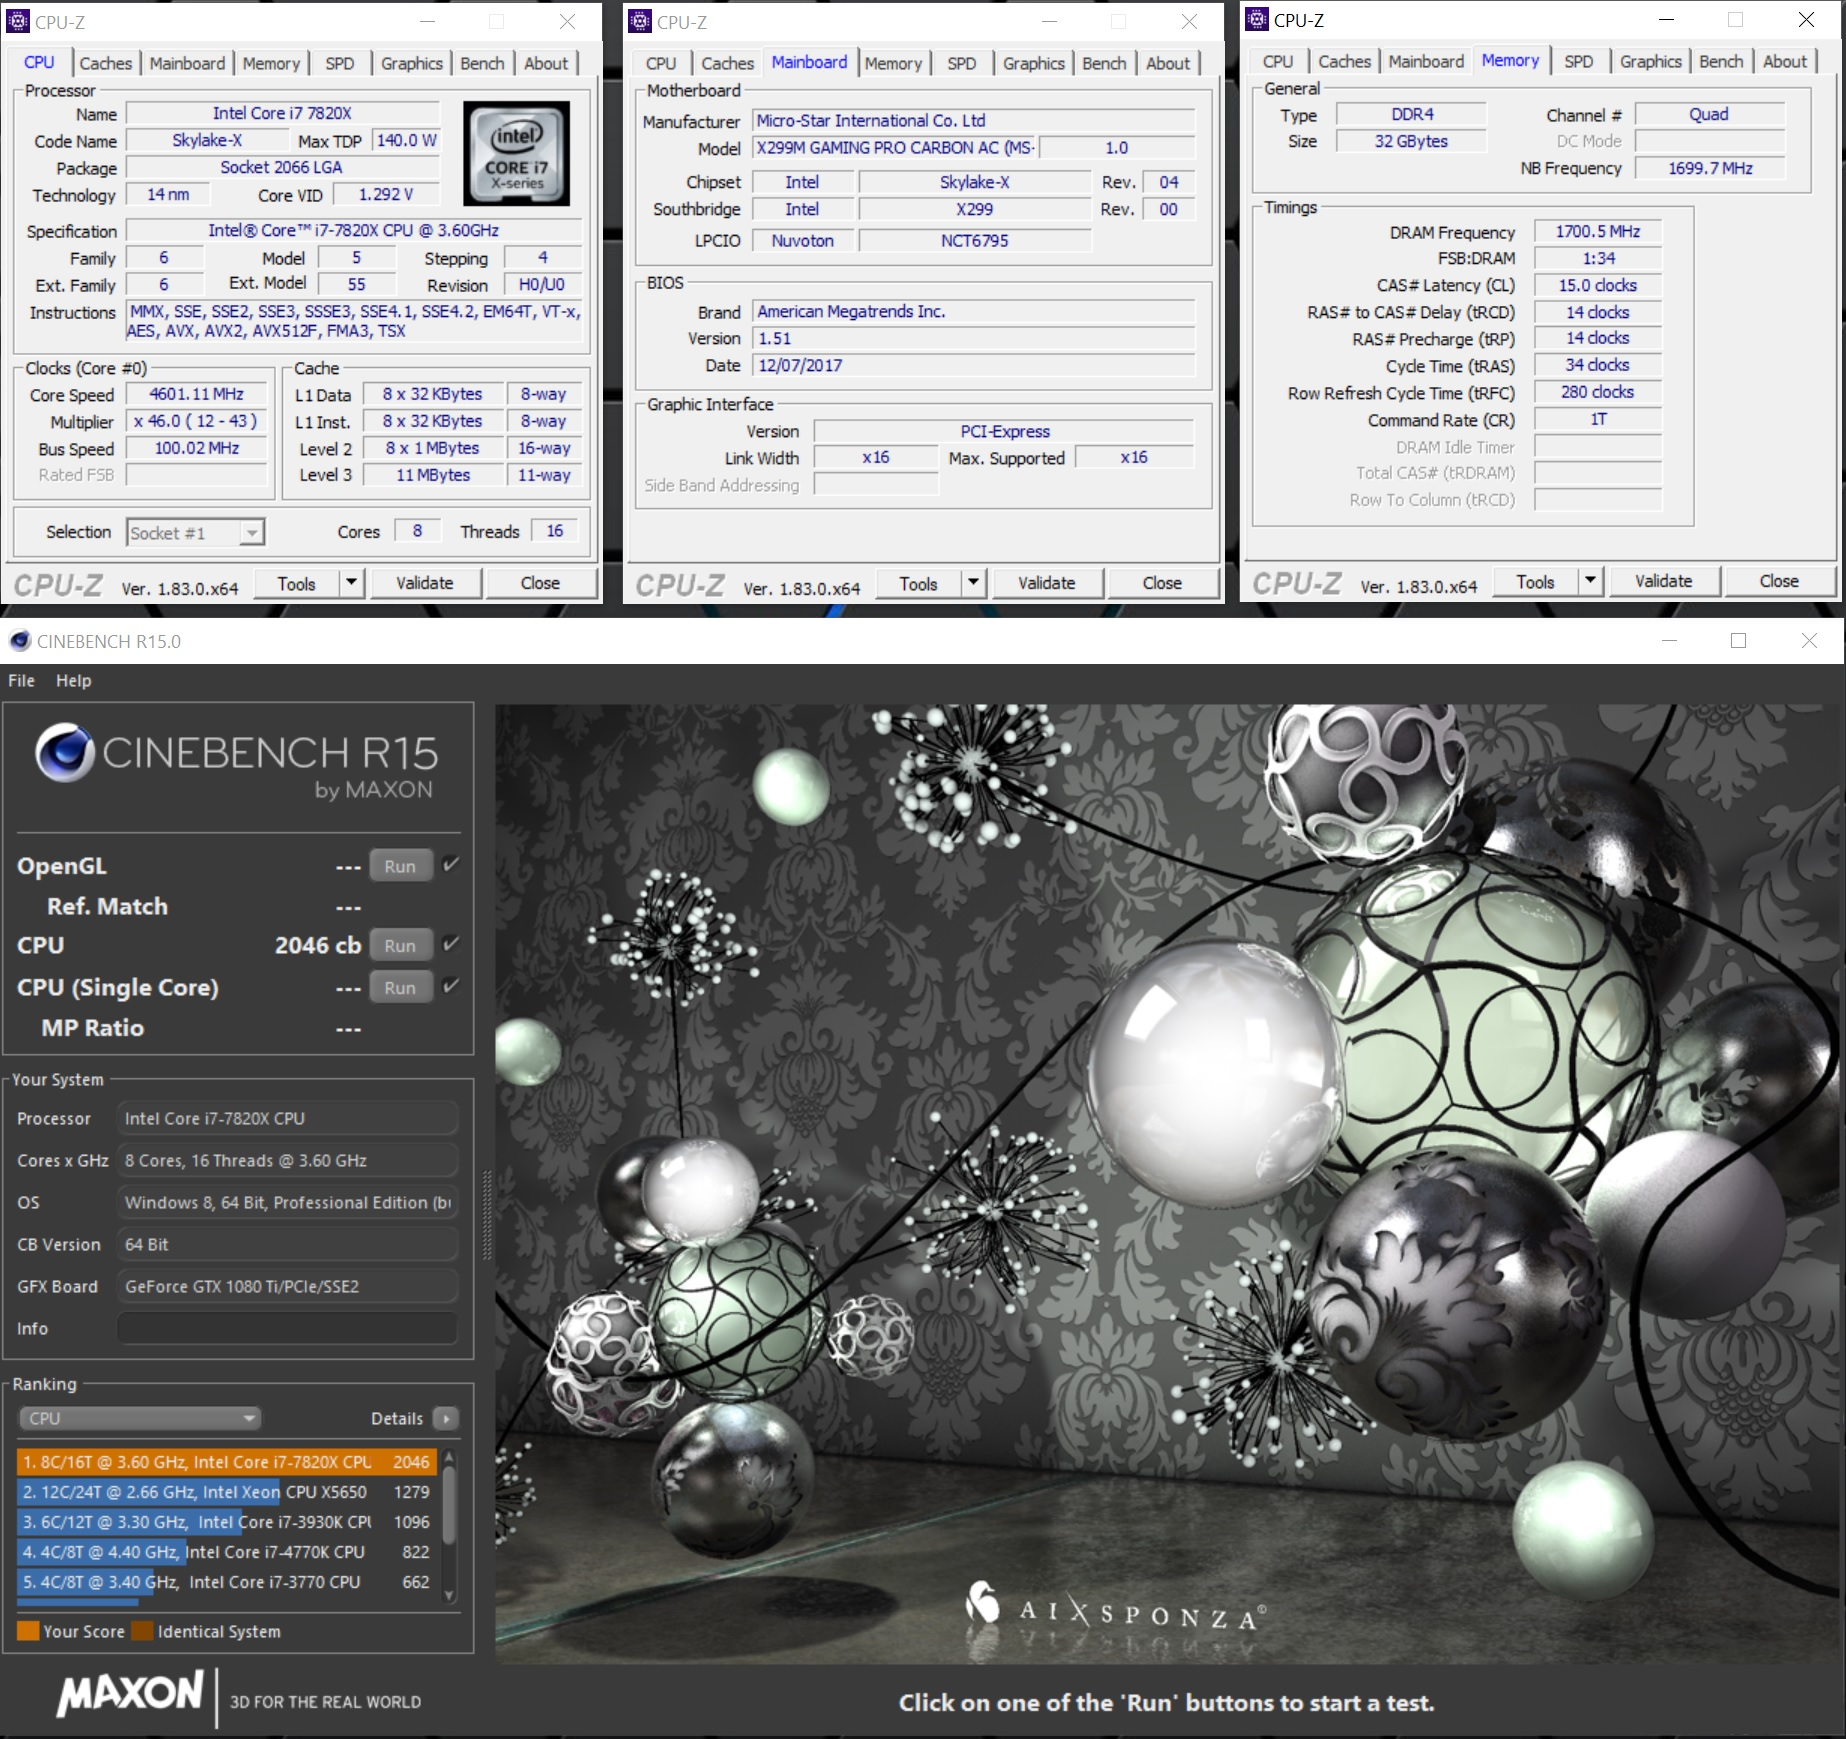 Dia01 - Conebench R15.0 (Mesh 32, CPU 4.6, 15-14-14-34 280 1T).jpg